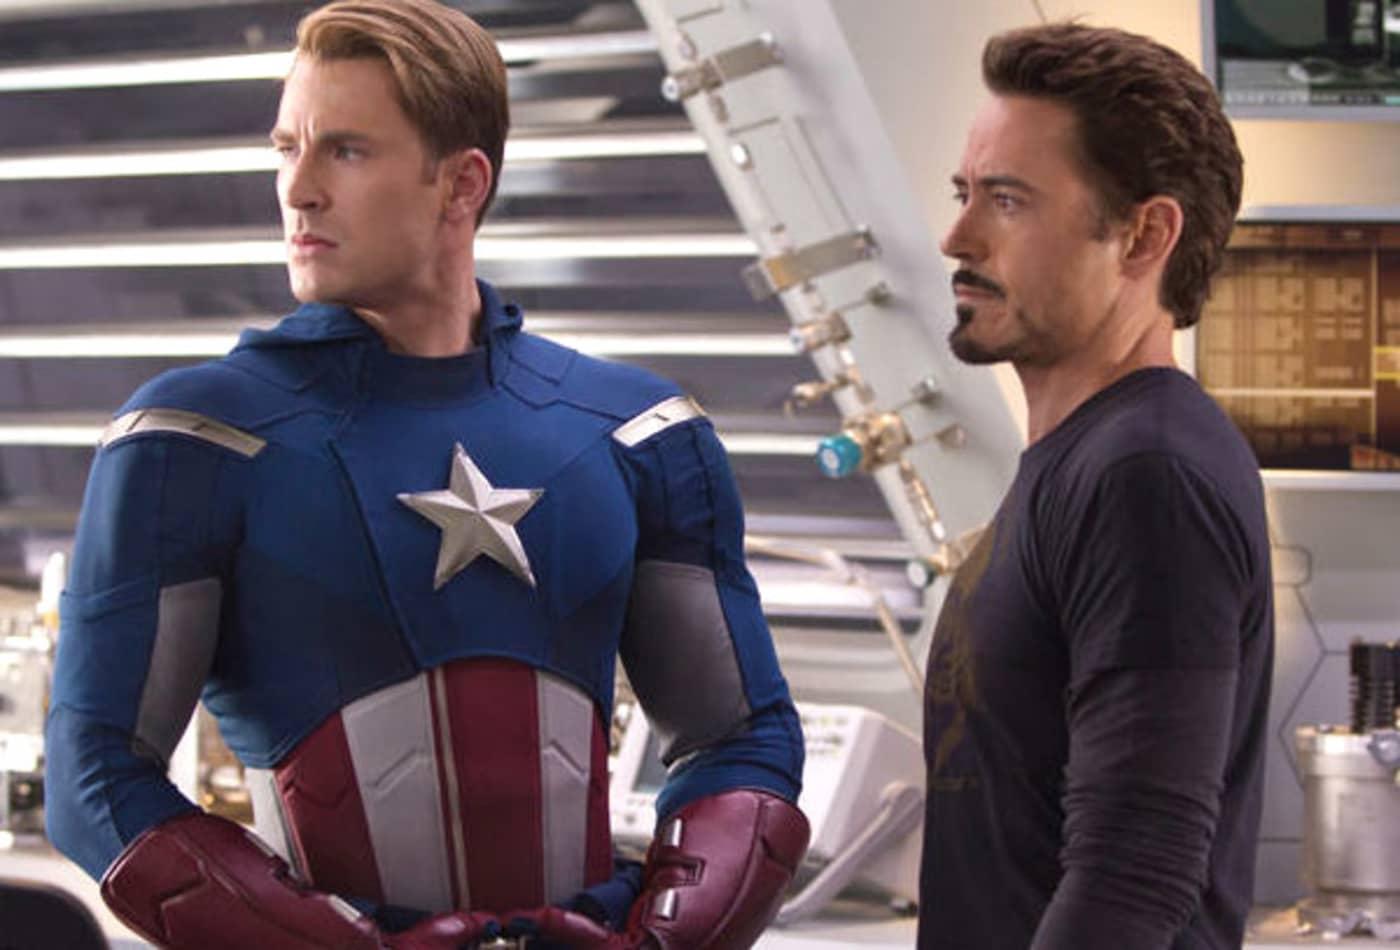 CNBC_superhero_films_2011_avengers.jpg